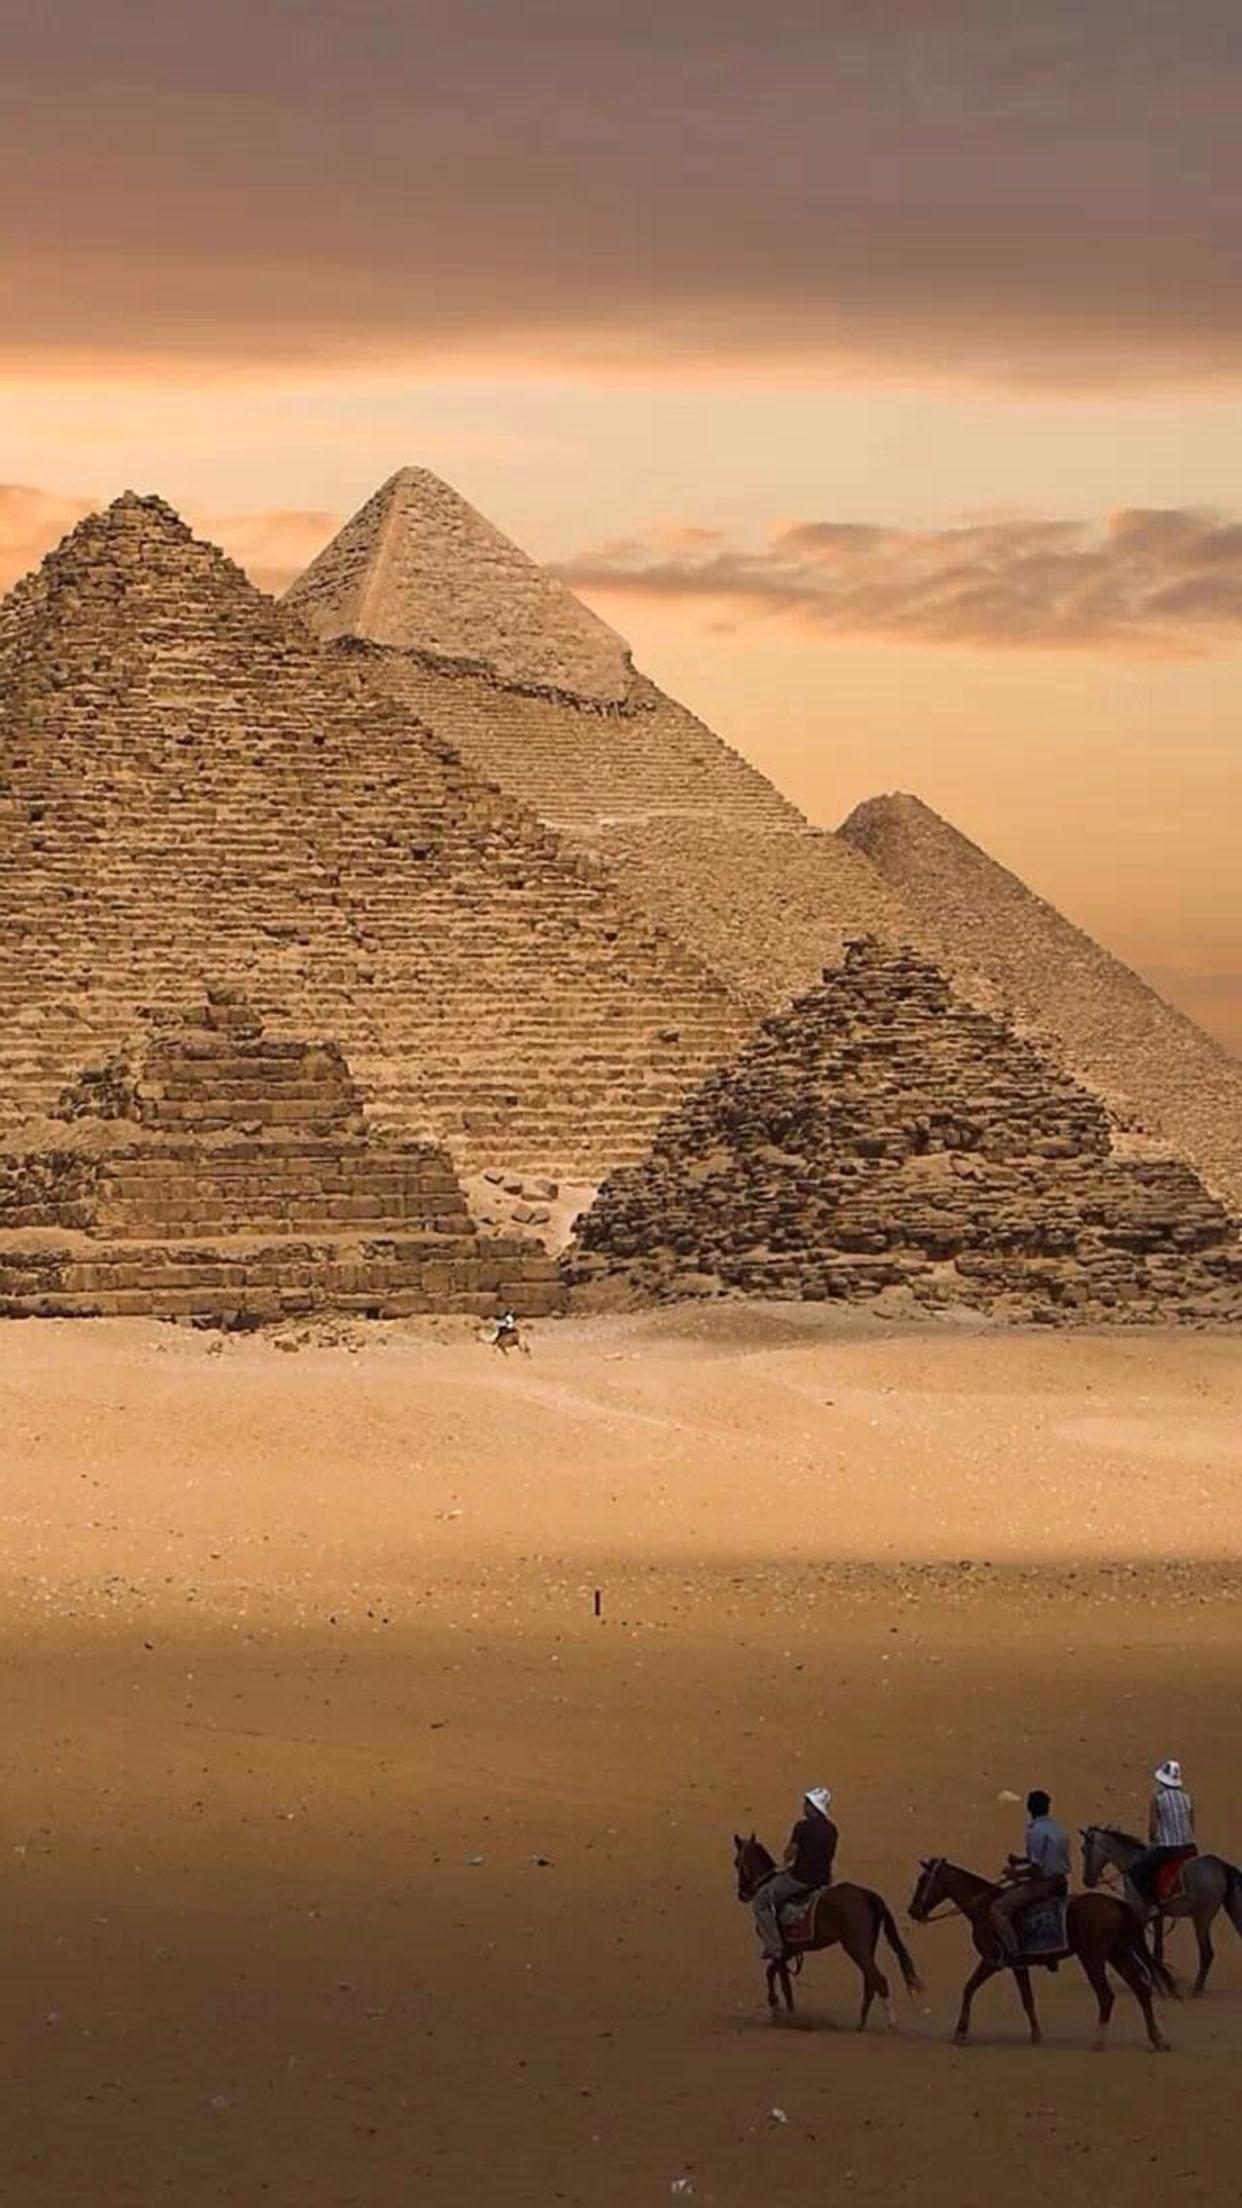 Pyramide Pyramide 2 3Wallpapers iPhone Parallax Pyramide 2